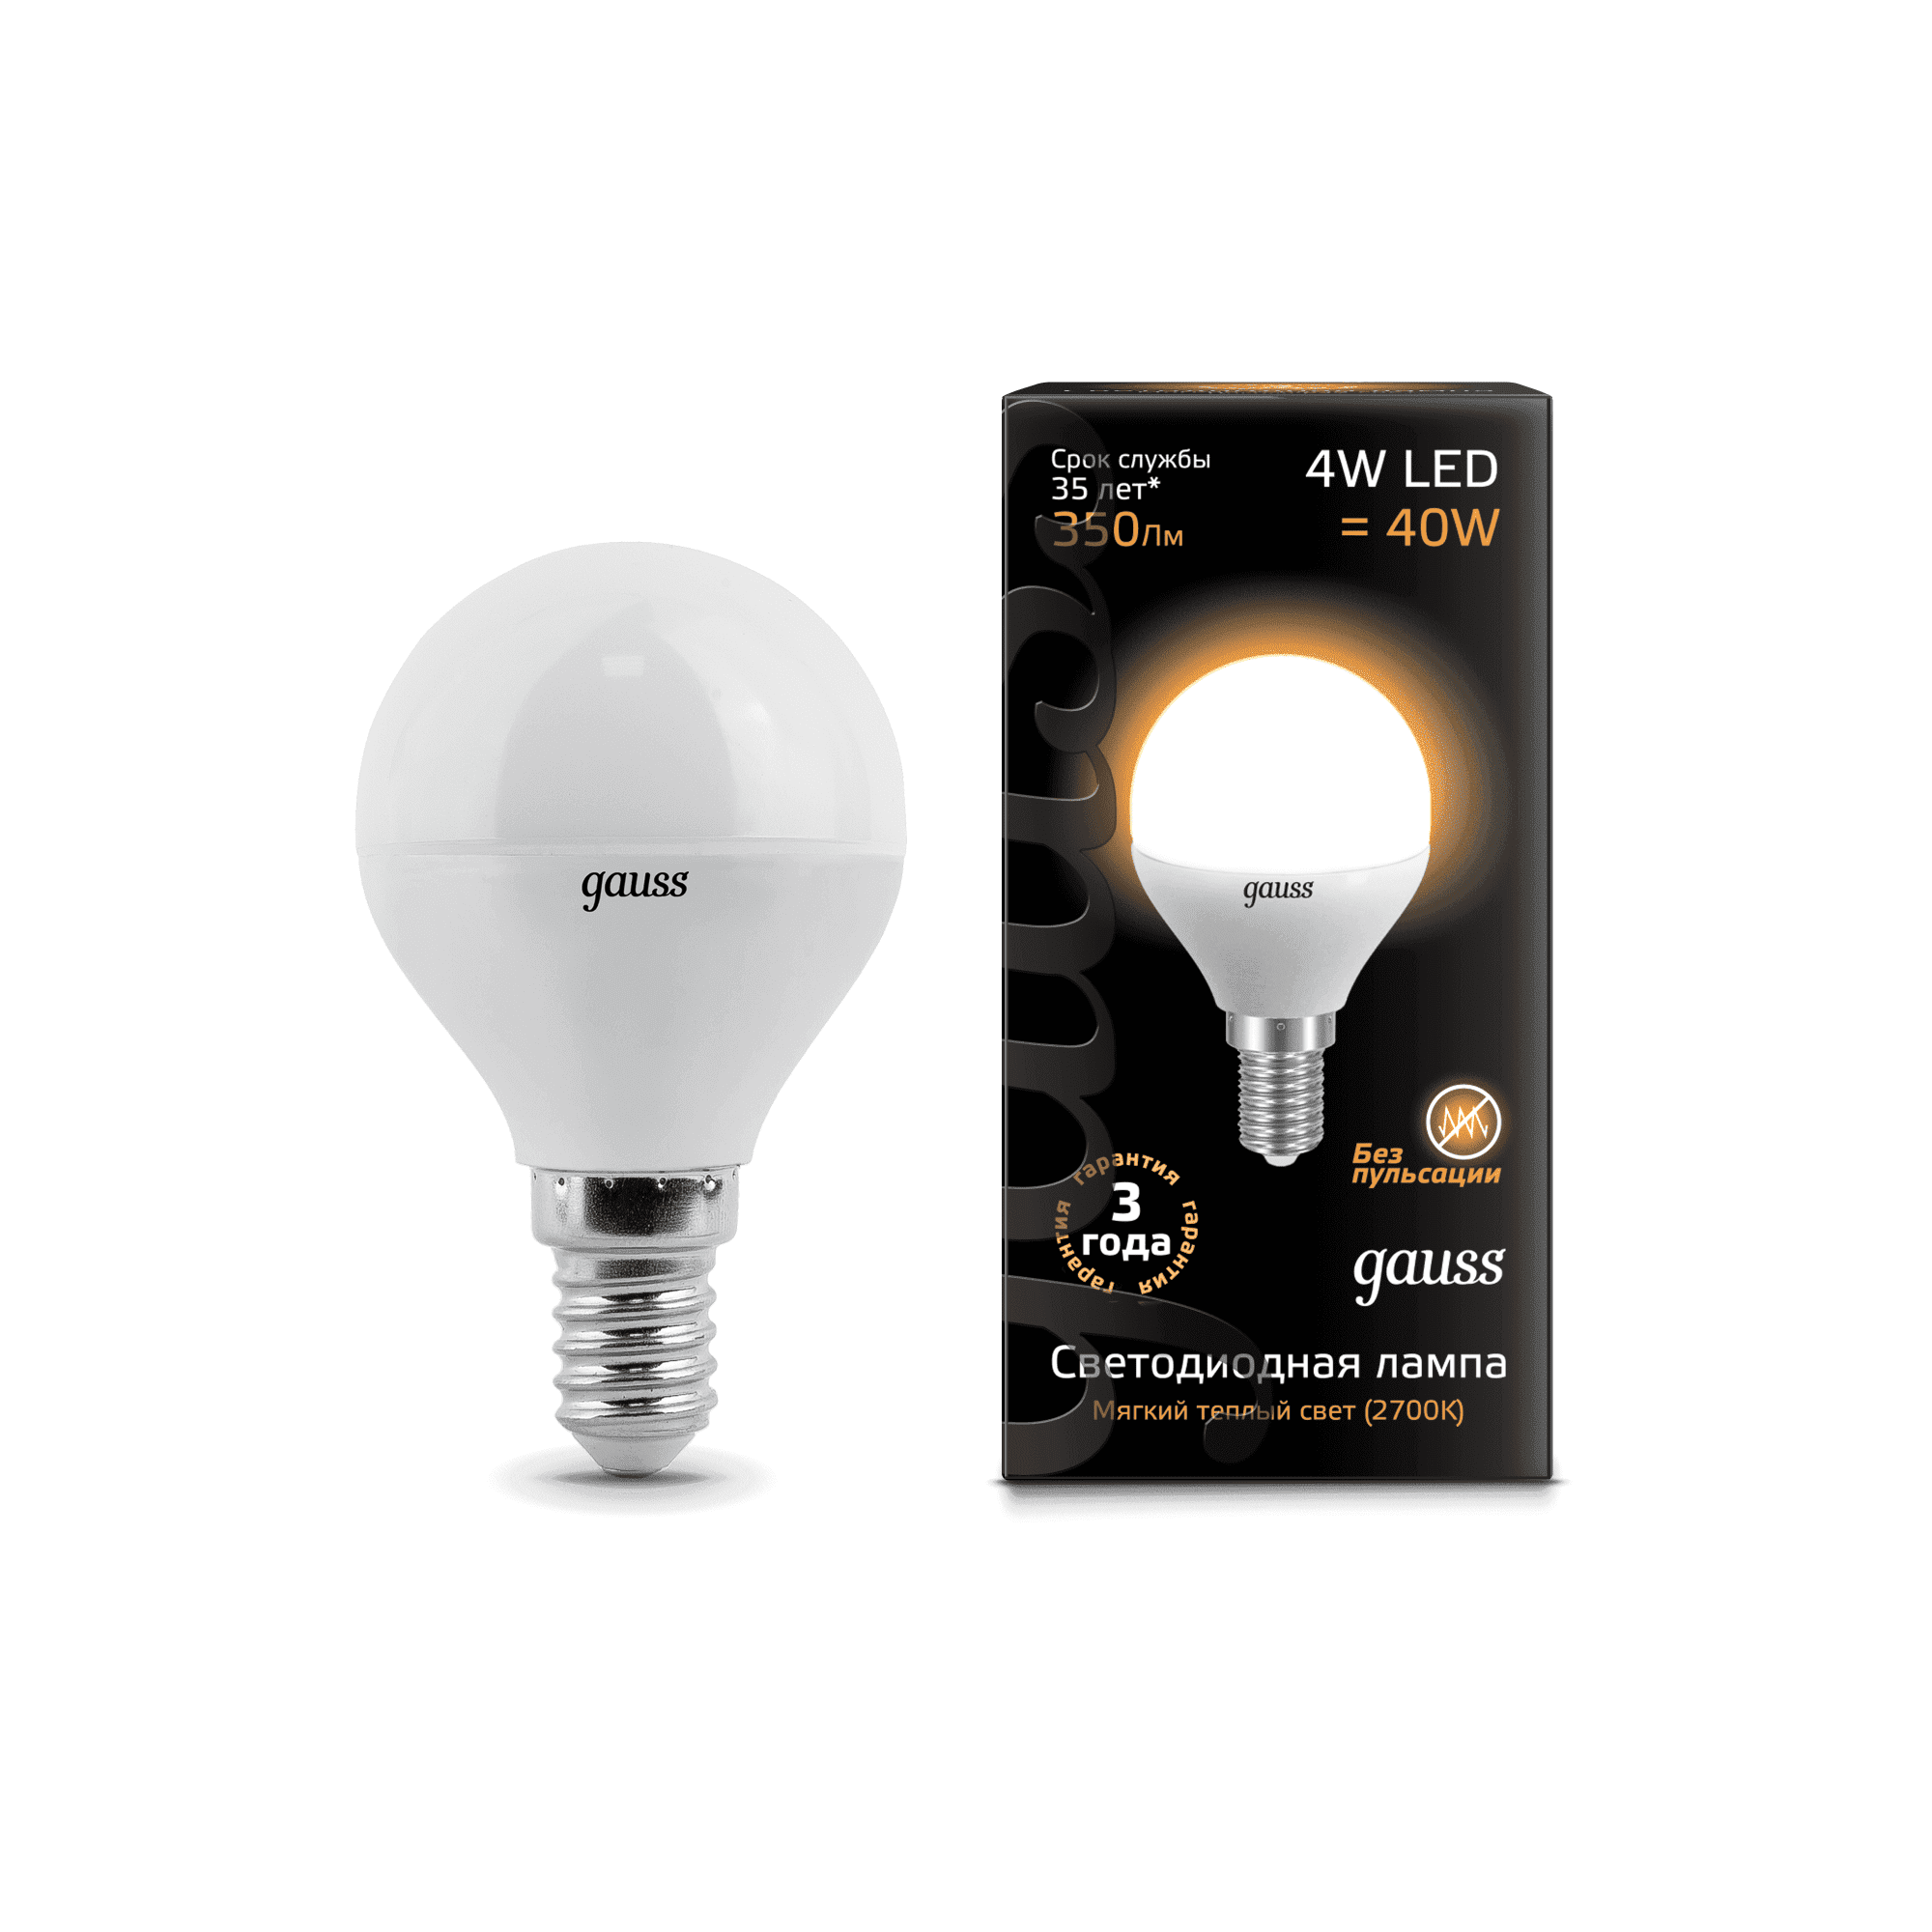 Gauss LED Globe 4W E14 2700K 1/10/50 арт. EB105101104